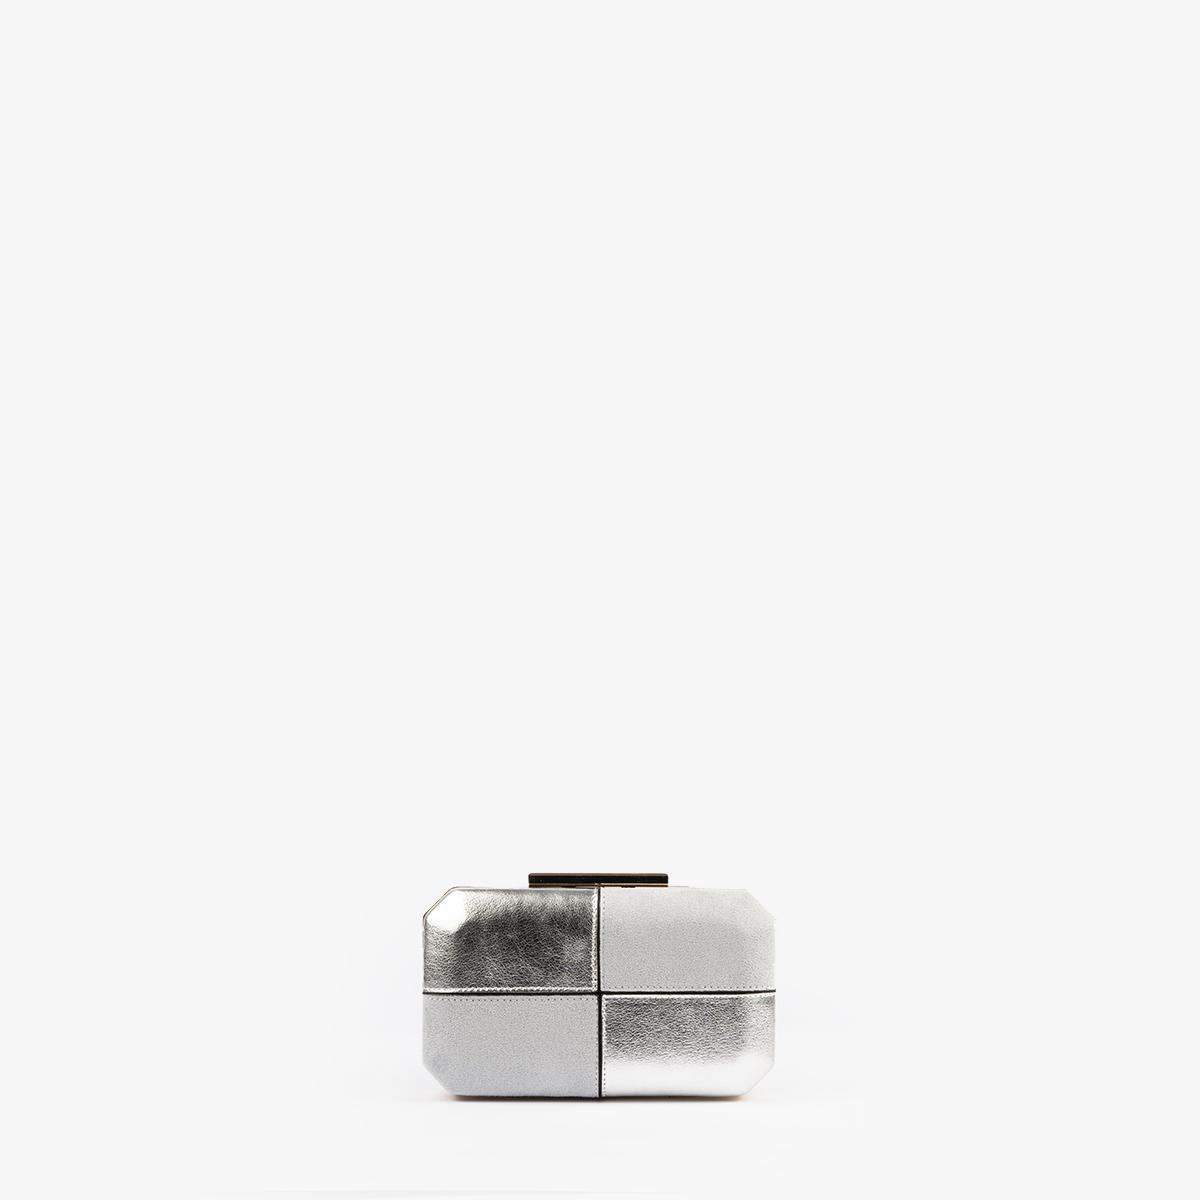 61032 bolso de mano color plata pepemoll